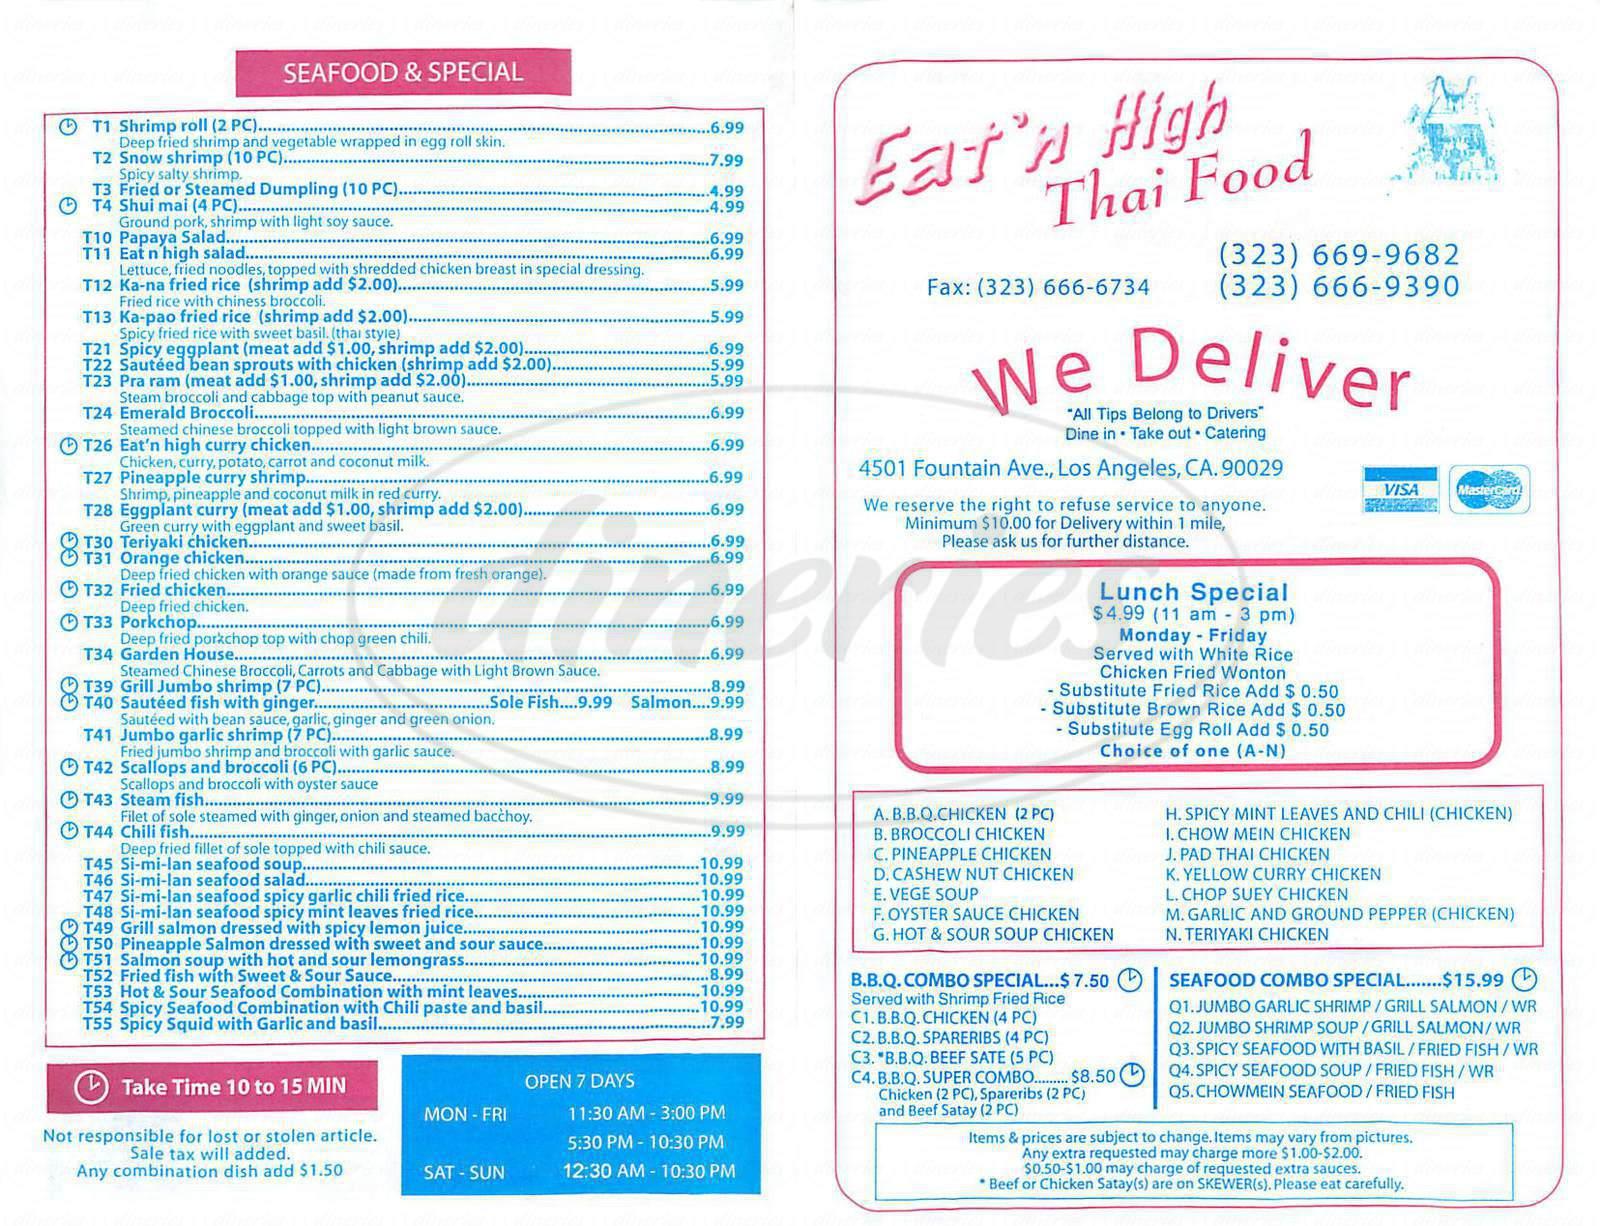 menu for Eat'n High Thai Food Restaurant